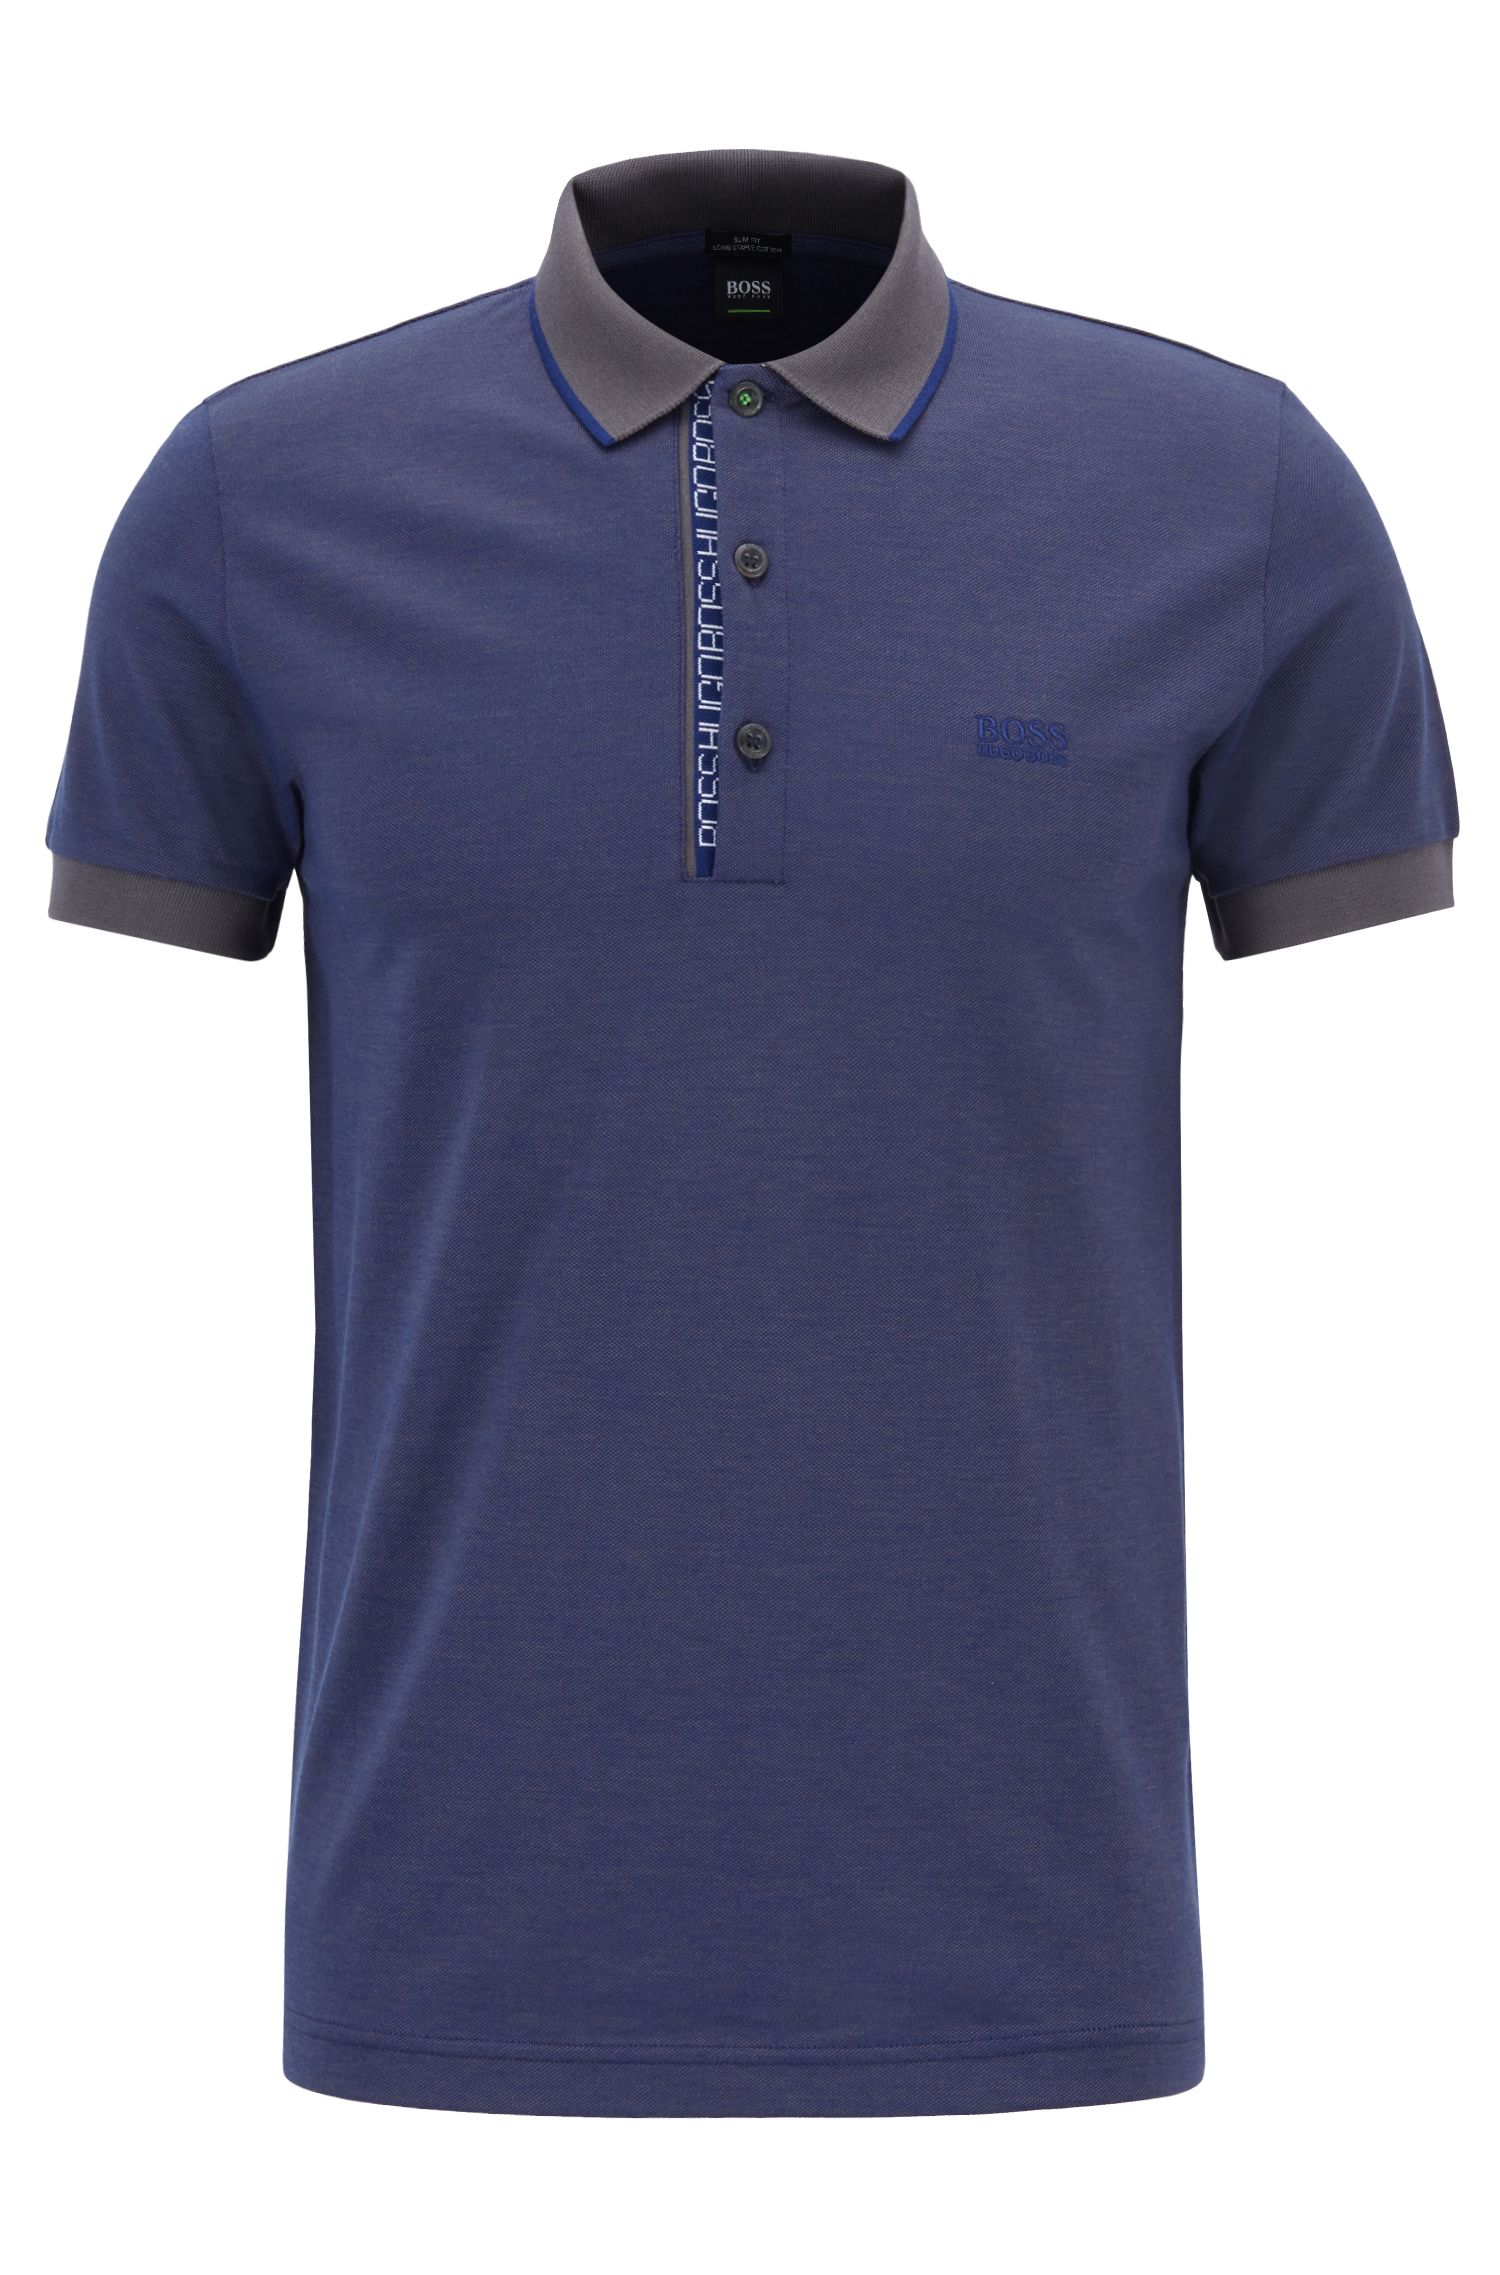 Slim-Fit Poloshirt aus Baumwoll-Piqué mit Logo-Detail, Dunkel Lila